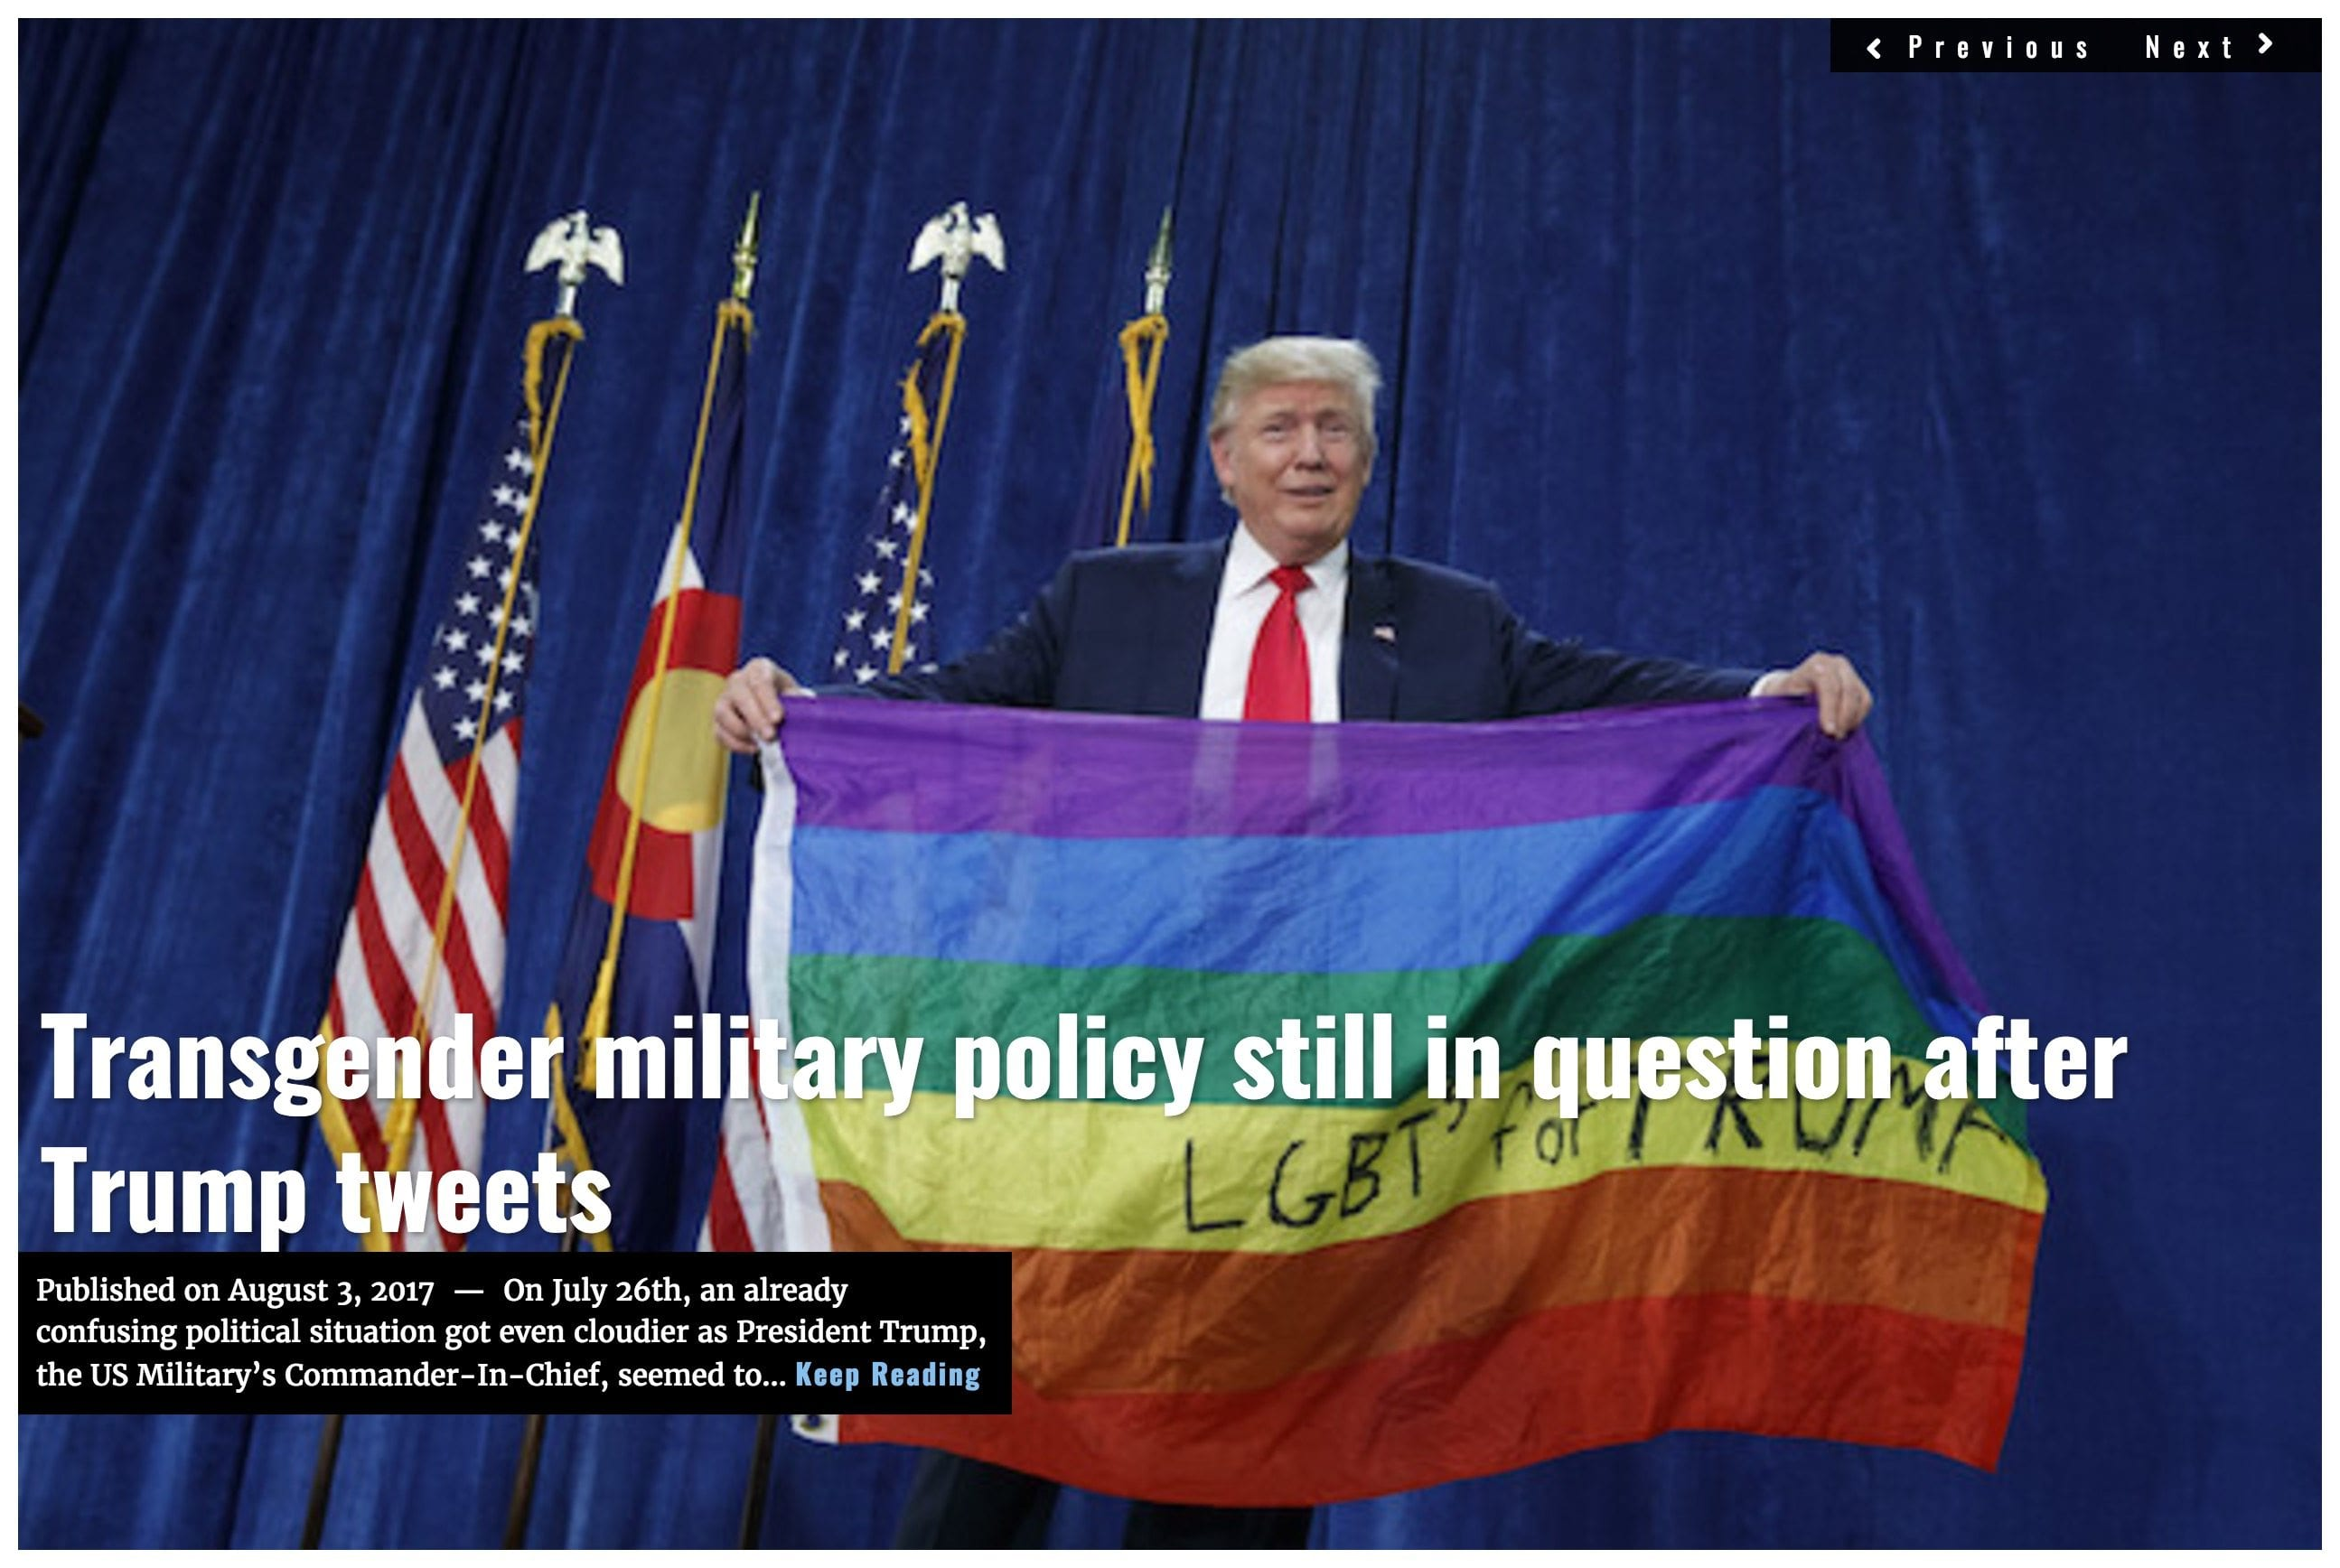 Image Lima Charlie News headline Trump transgender